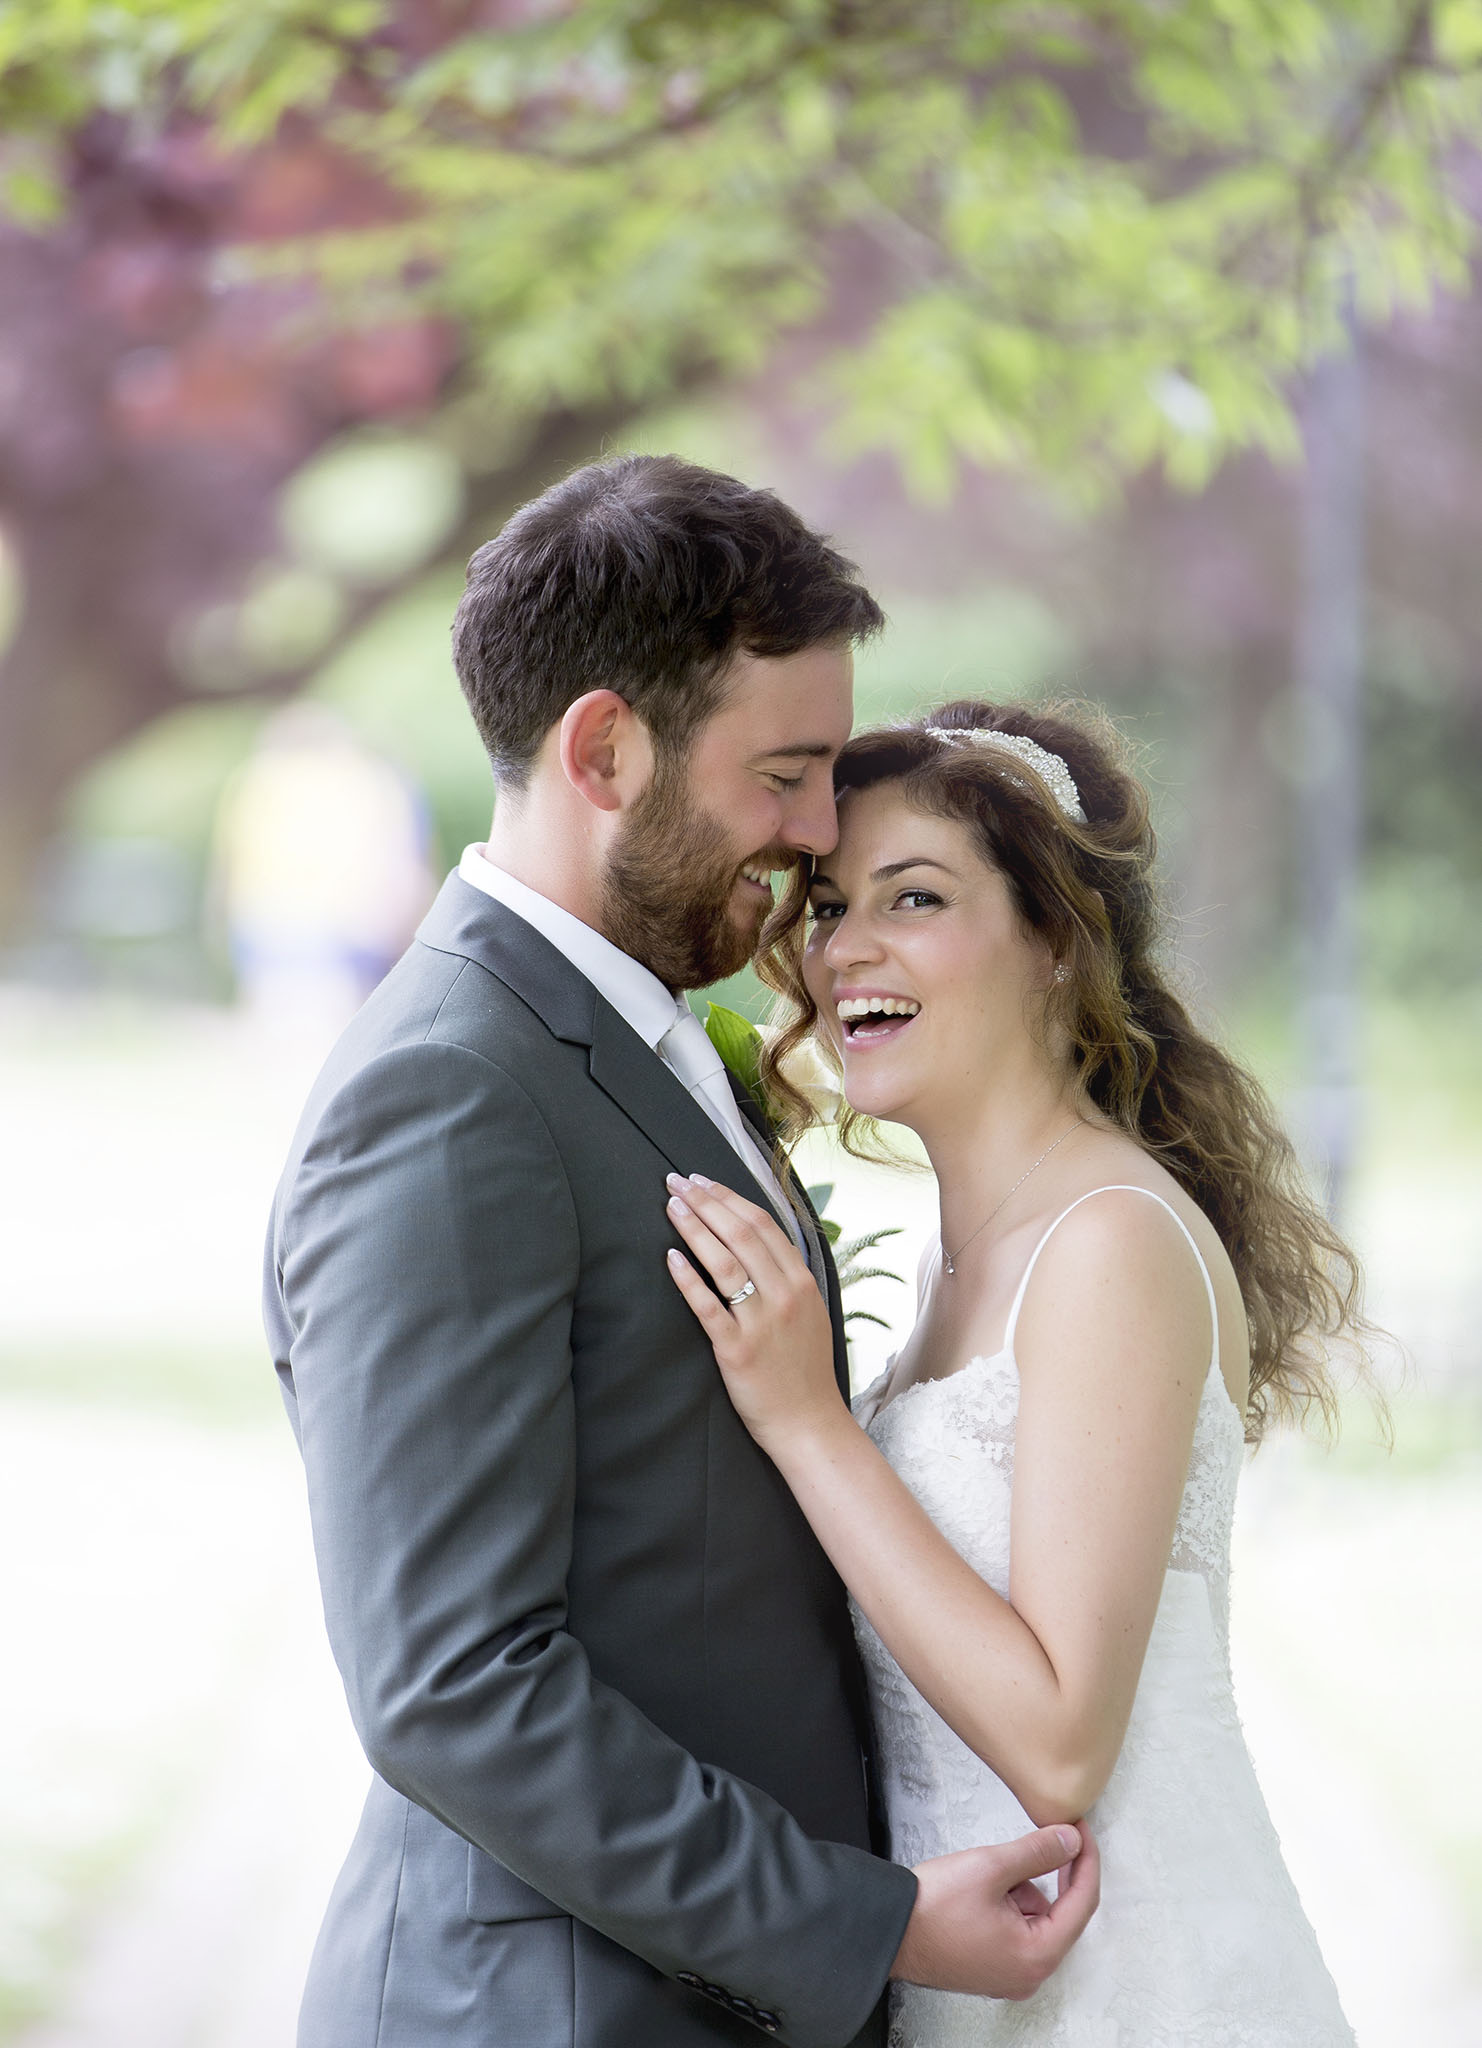 elizabethgphotography_kingslangley_hertfordshire_fineart_wedding_enfield_ricky_nicole_nahlis_54.jpg